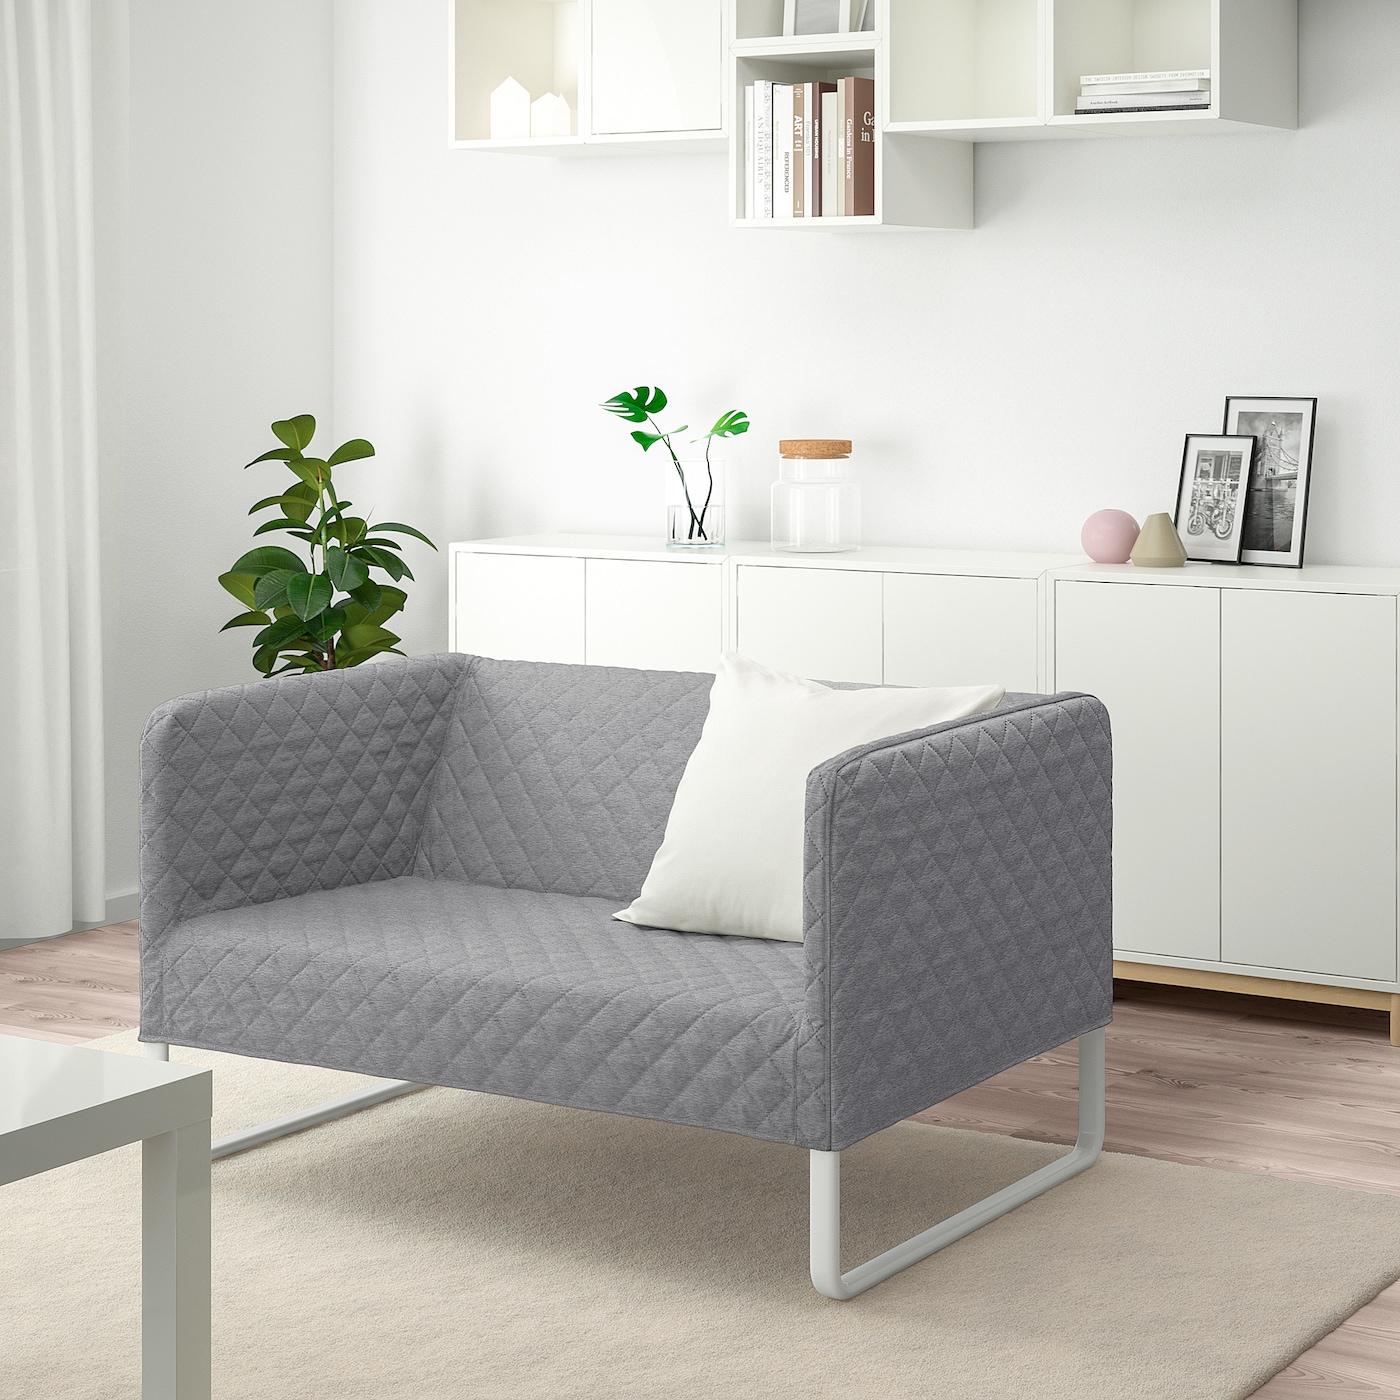 KNOPPARP 2er-Sofa, Knisa hellgrau